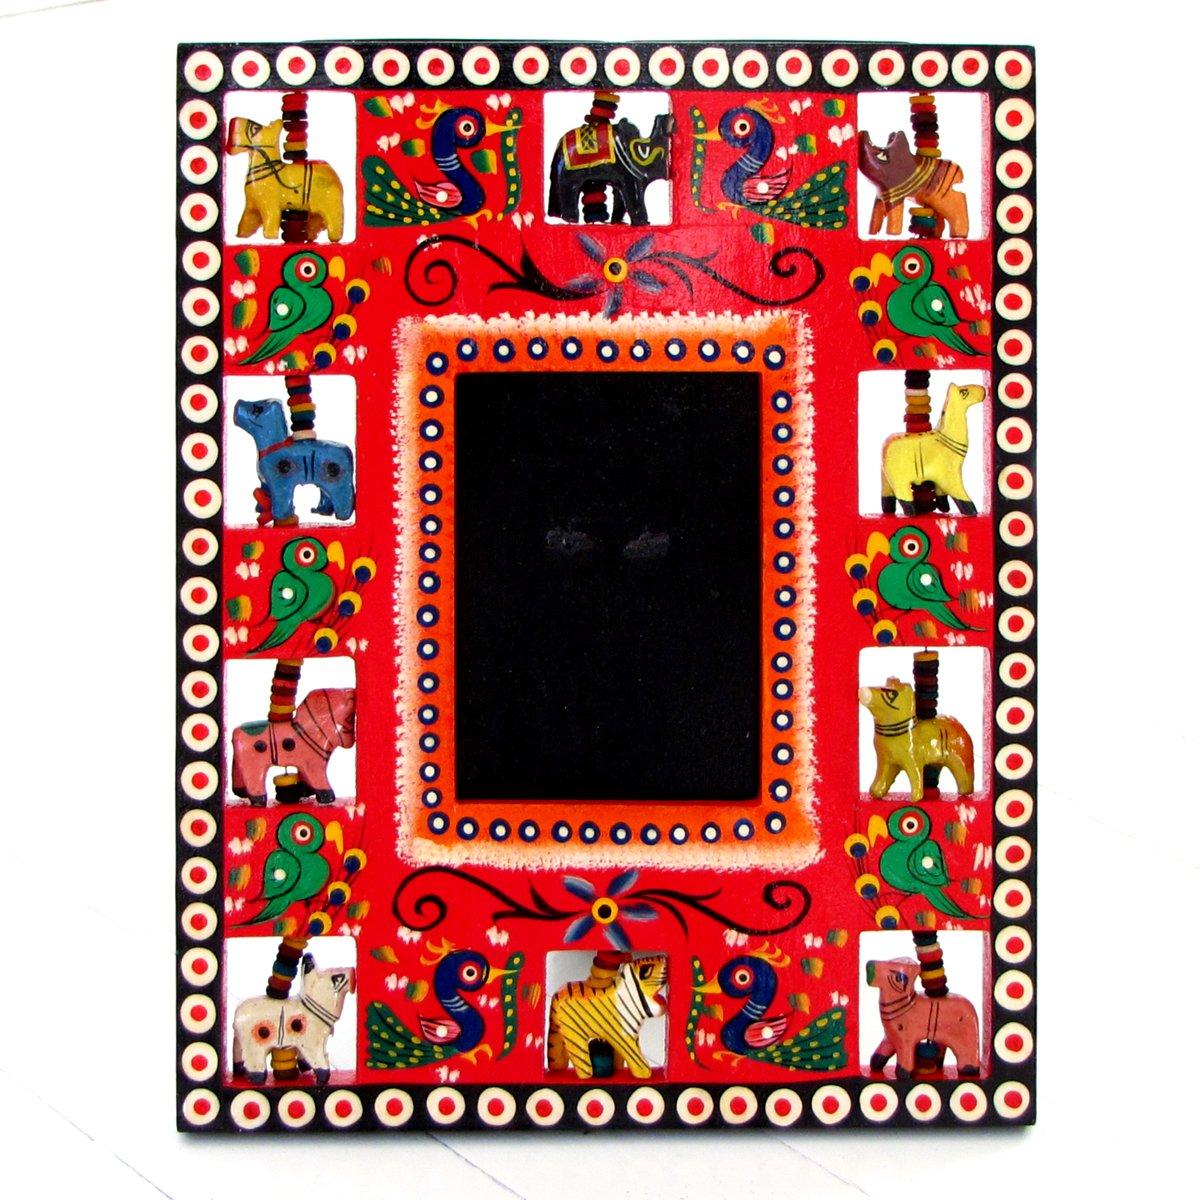 Photo framing 3.5x4.5 (8x10) handmade home decor accessories wooden red Indian craft folk art